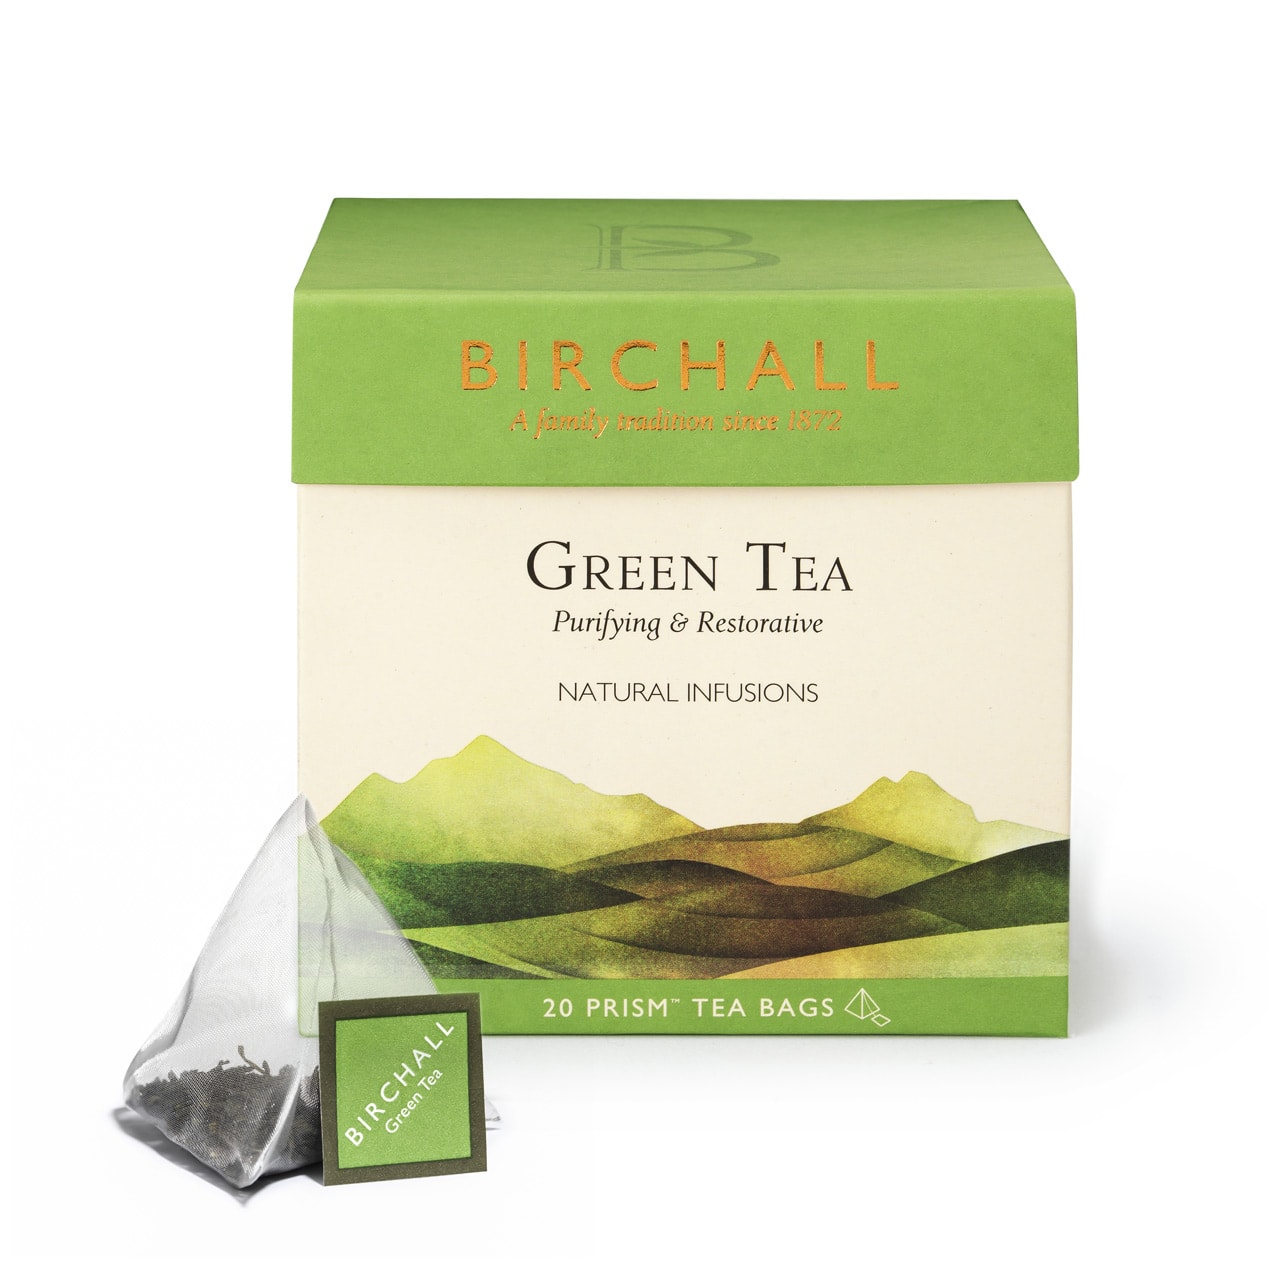 Green-Tea-20Prism-Front.jpg